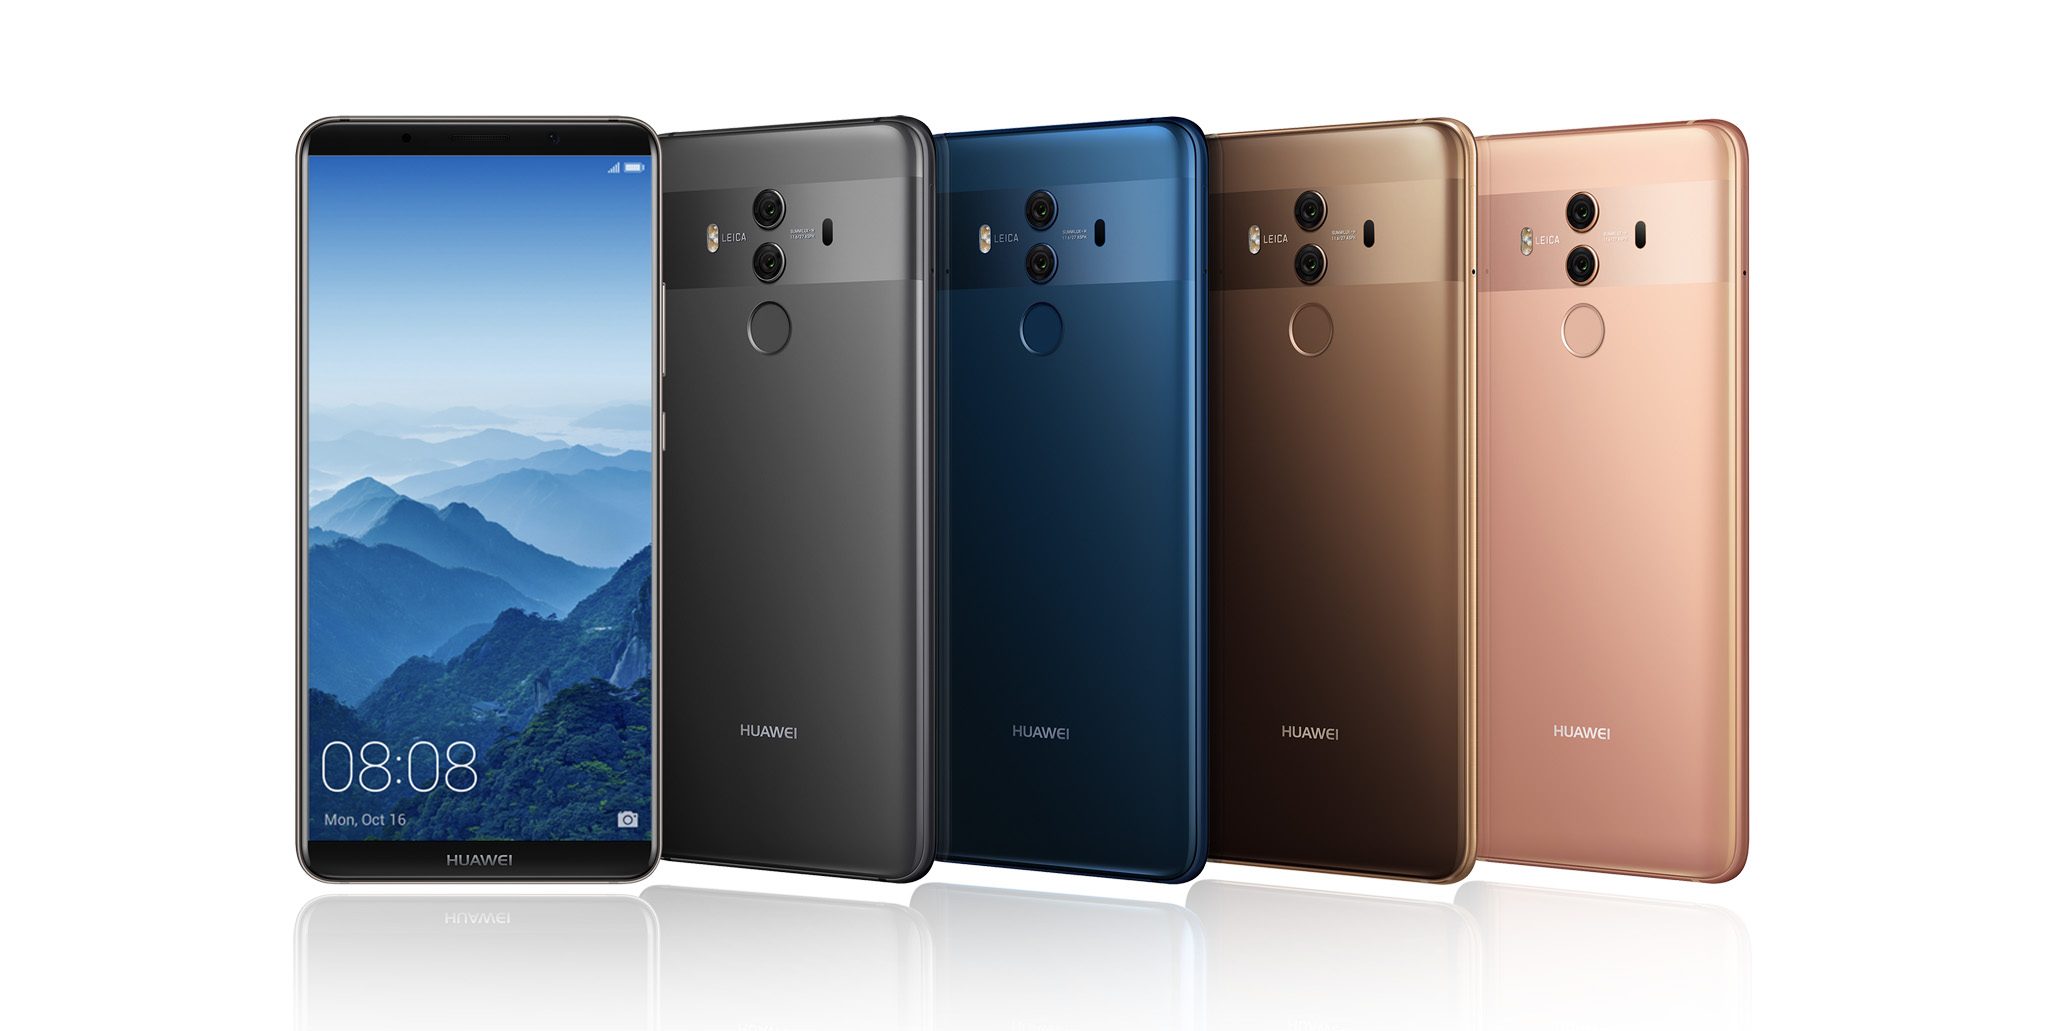 Genuine Huawei Mate 9 Verizon Compatibility Huawei Mate 9 Mha L29 Verizon Huawei Is Apparently Gunning A Mate Pro Launch On Verizon A Mate Pro Launch On Verizon Us Huawei Is Apparently Gunning dpreview Huawei Mate 9 Verizon